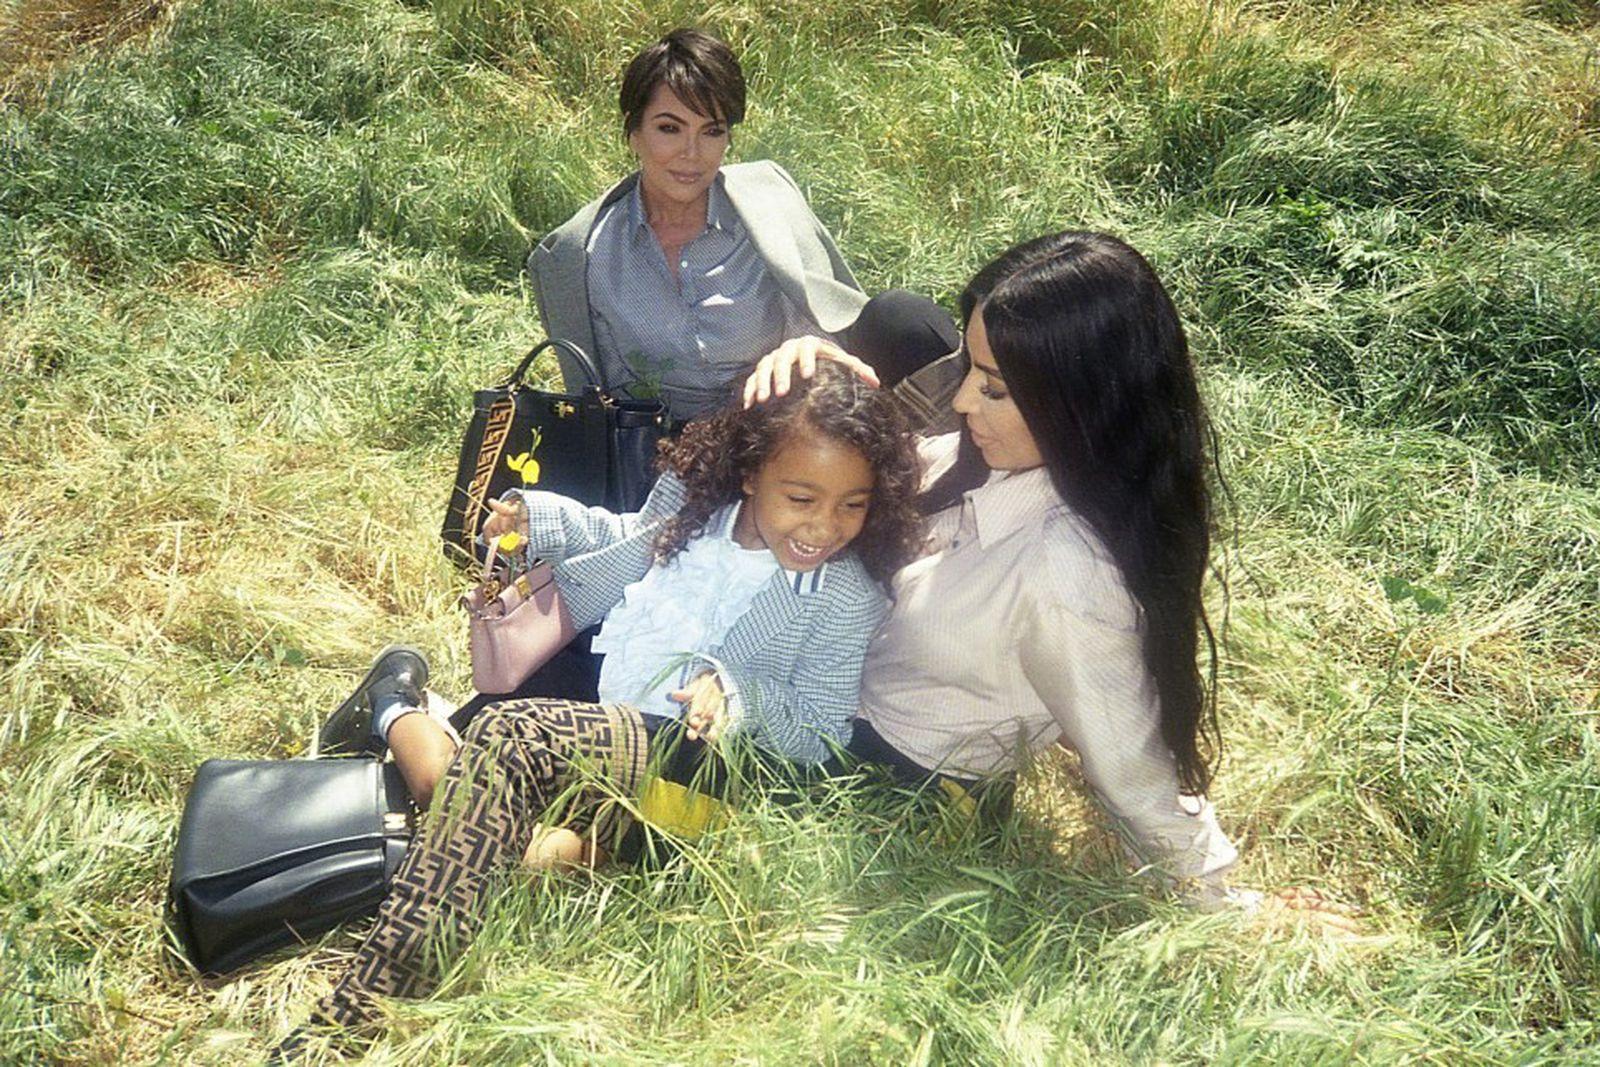 north west fendi campaign kim kardashian kris jenner Kim Kardashian West adidas by Stella McCartney byredo